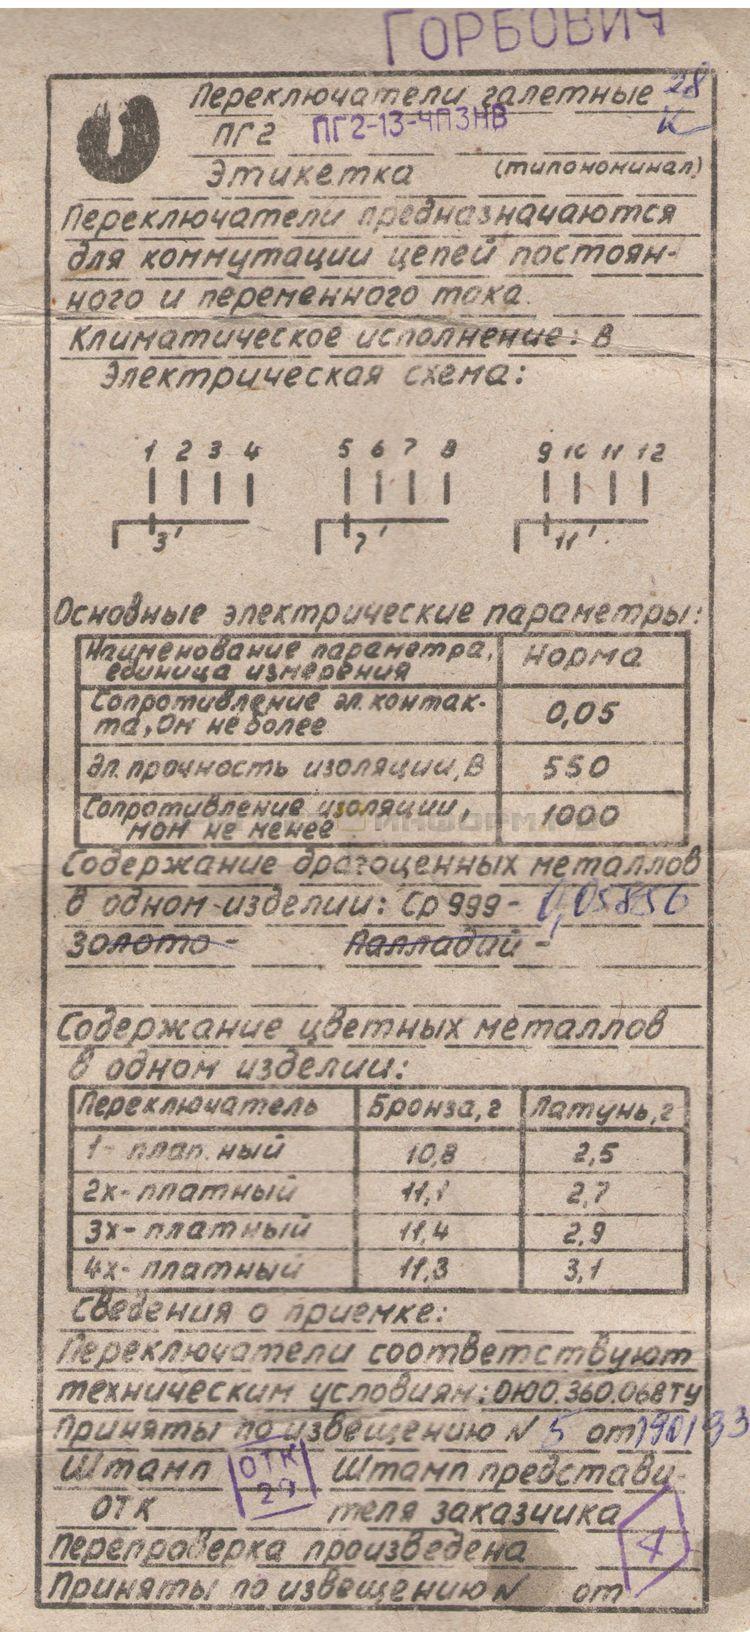 Формуляр ПГ2-13-4П3НВ